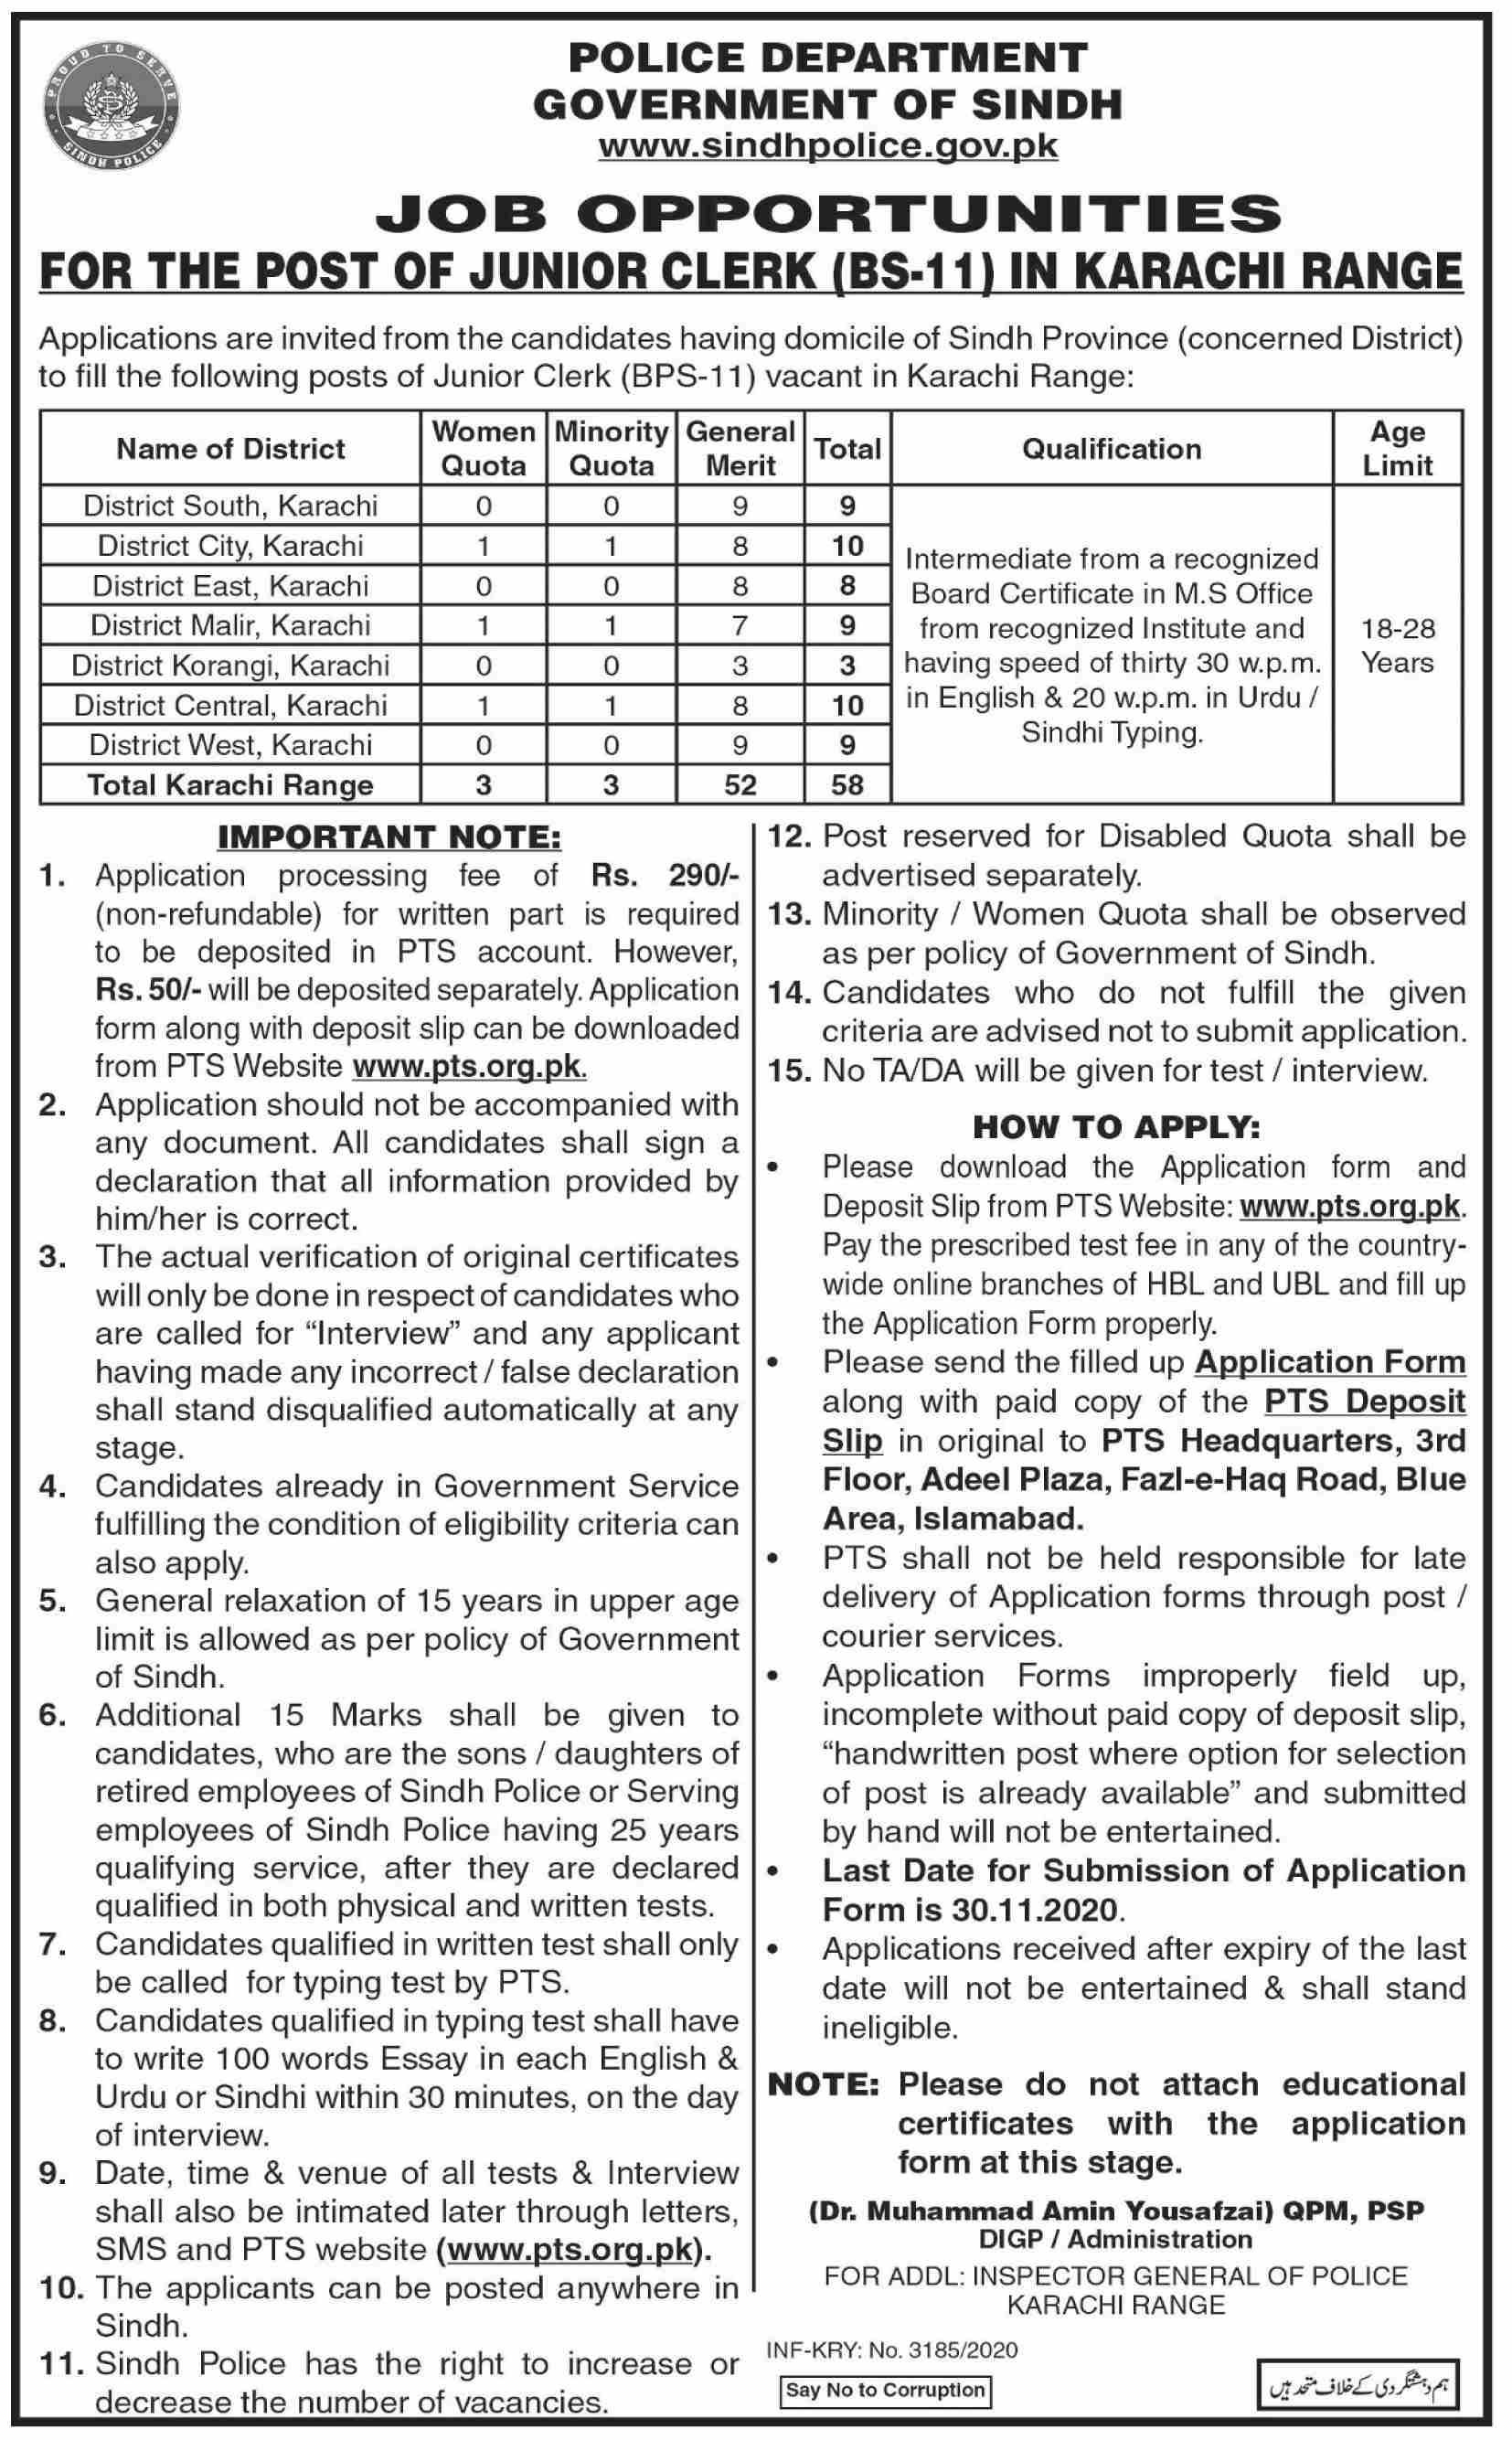 Sindh Police Department Karachi Jobs 2020